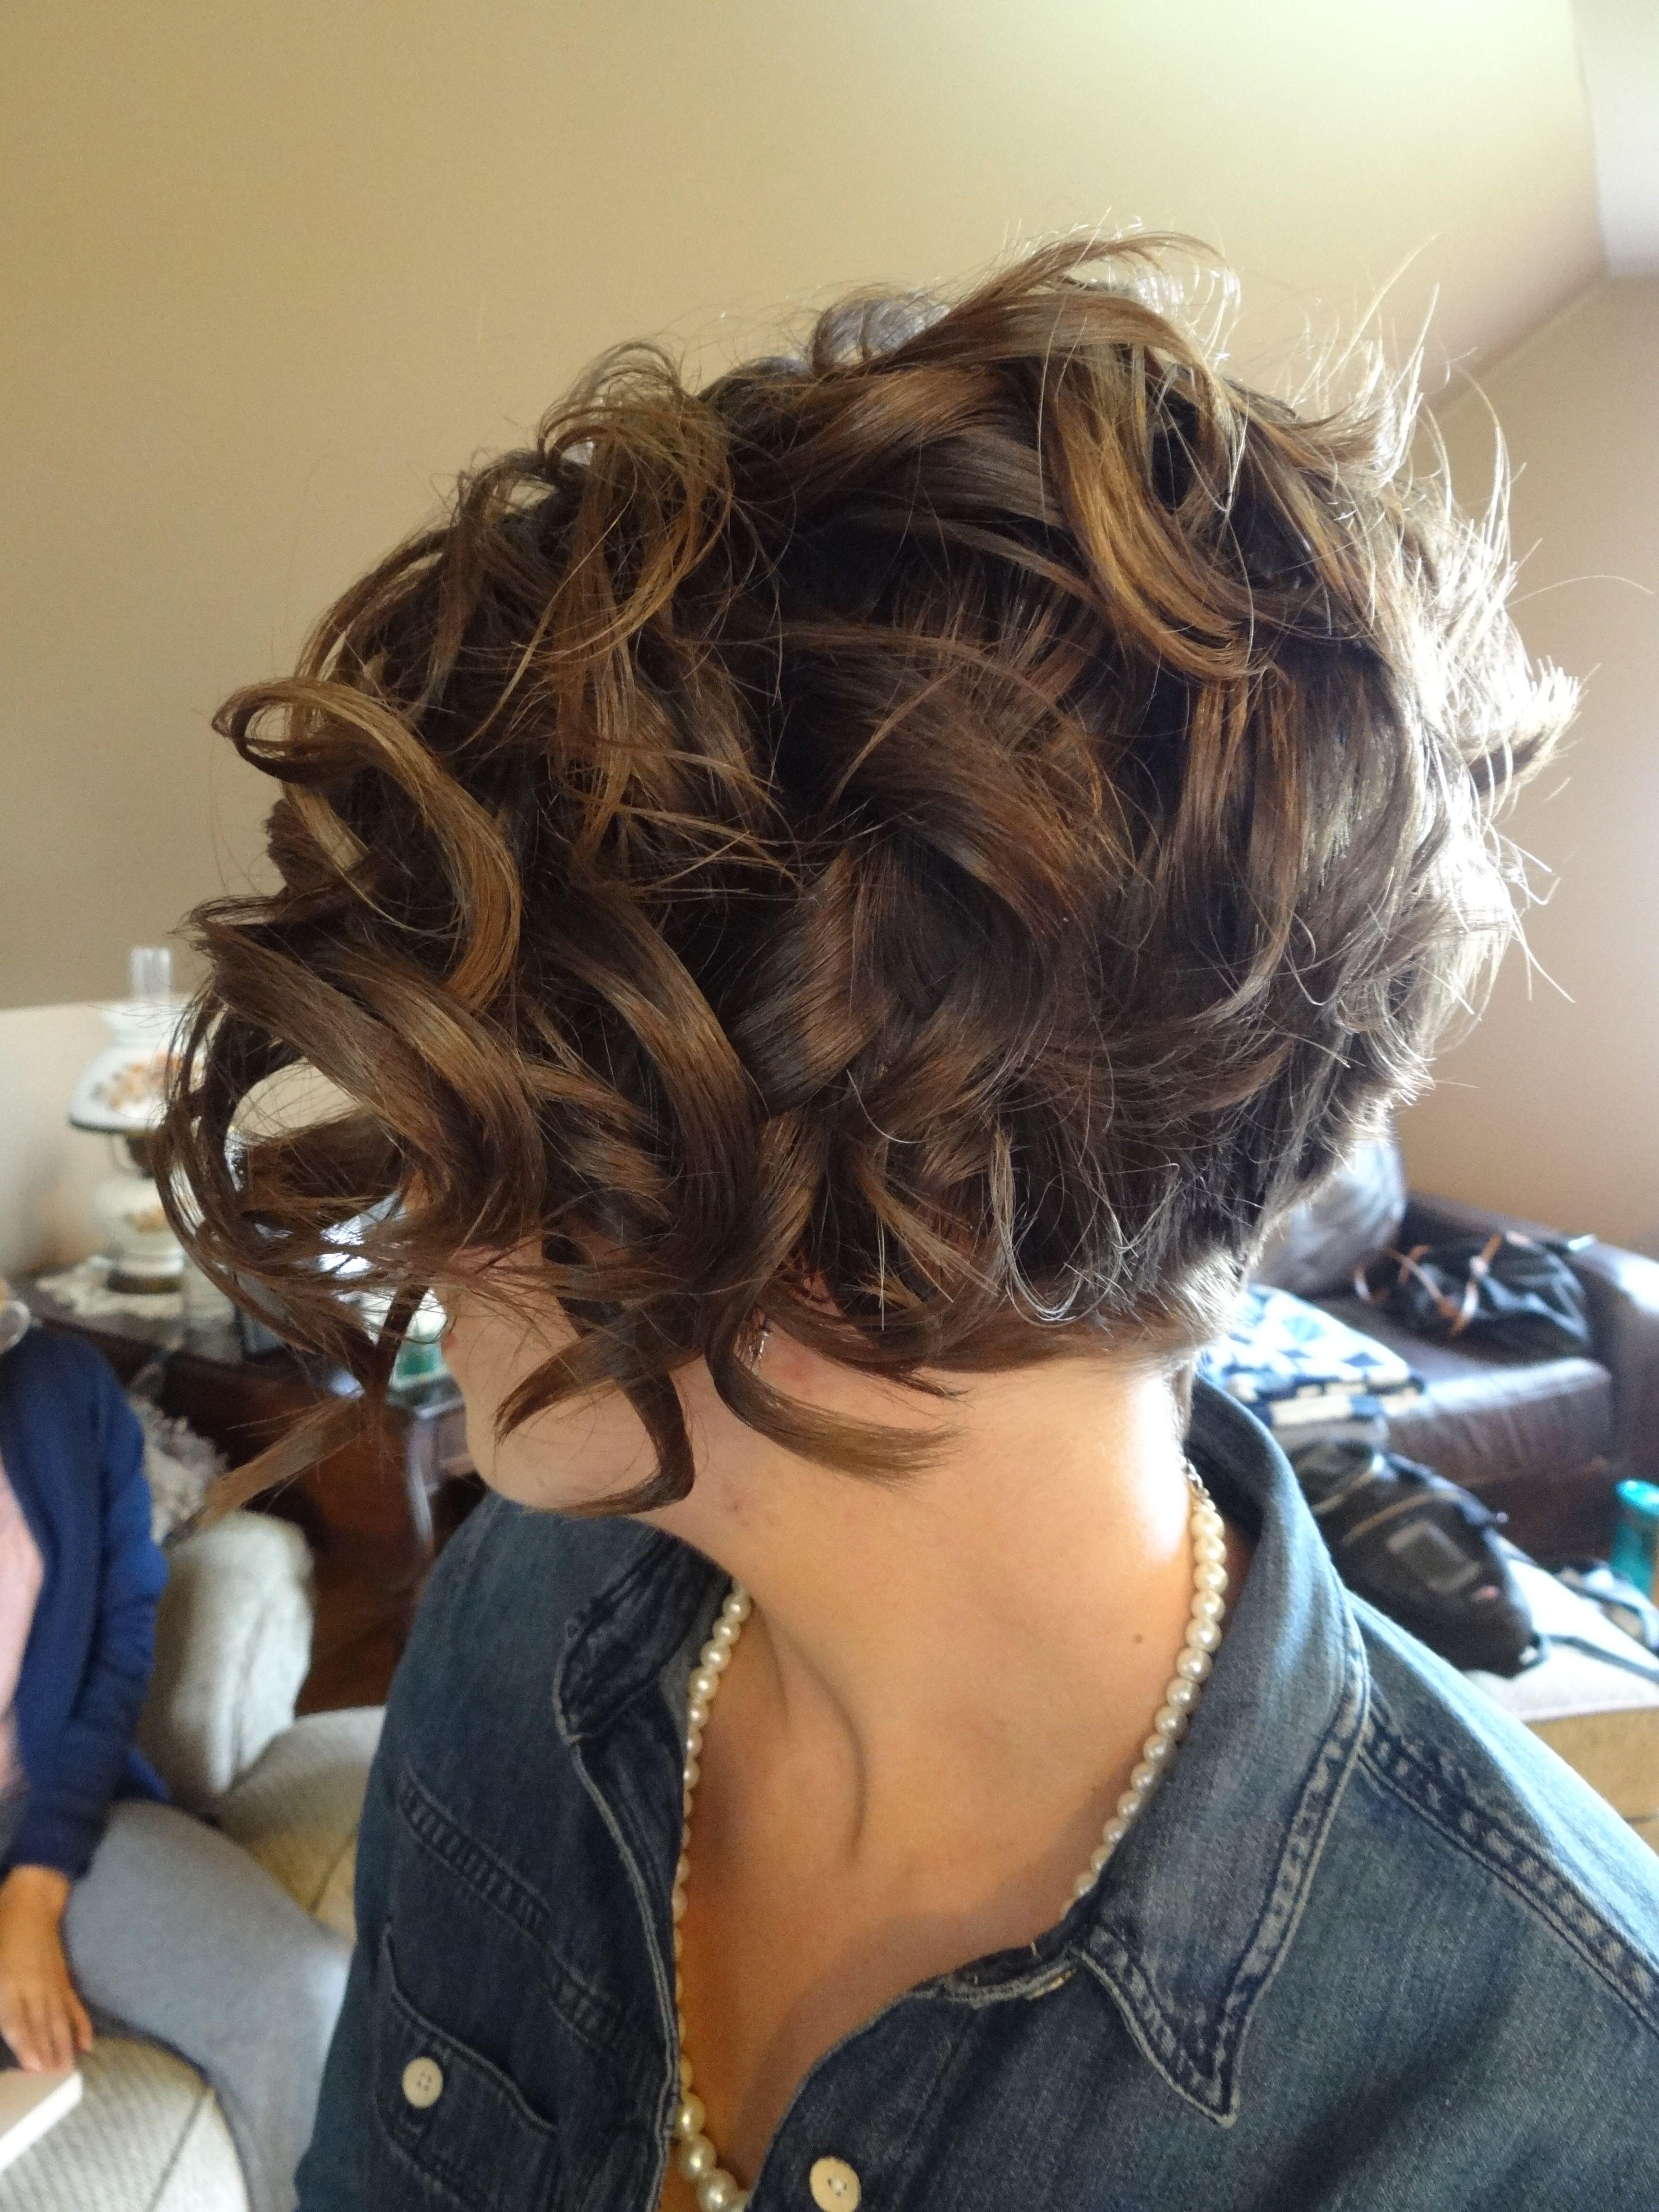 20 Stylish Very Short Hairstyles for Women Pinterest